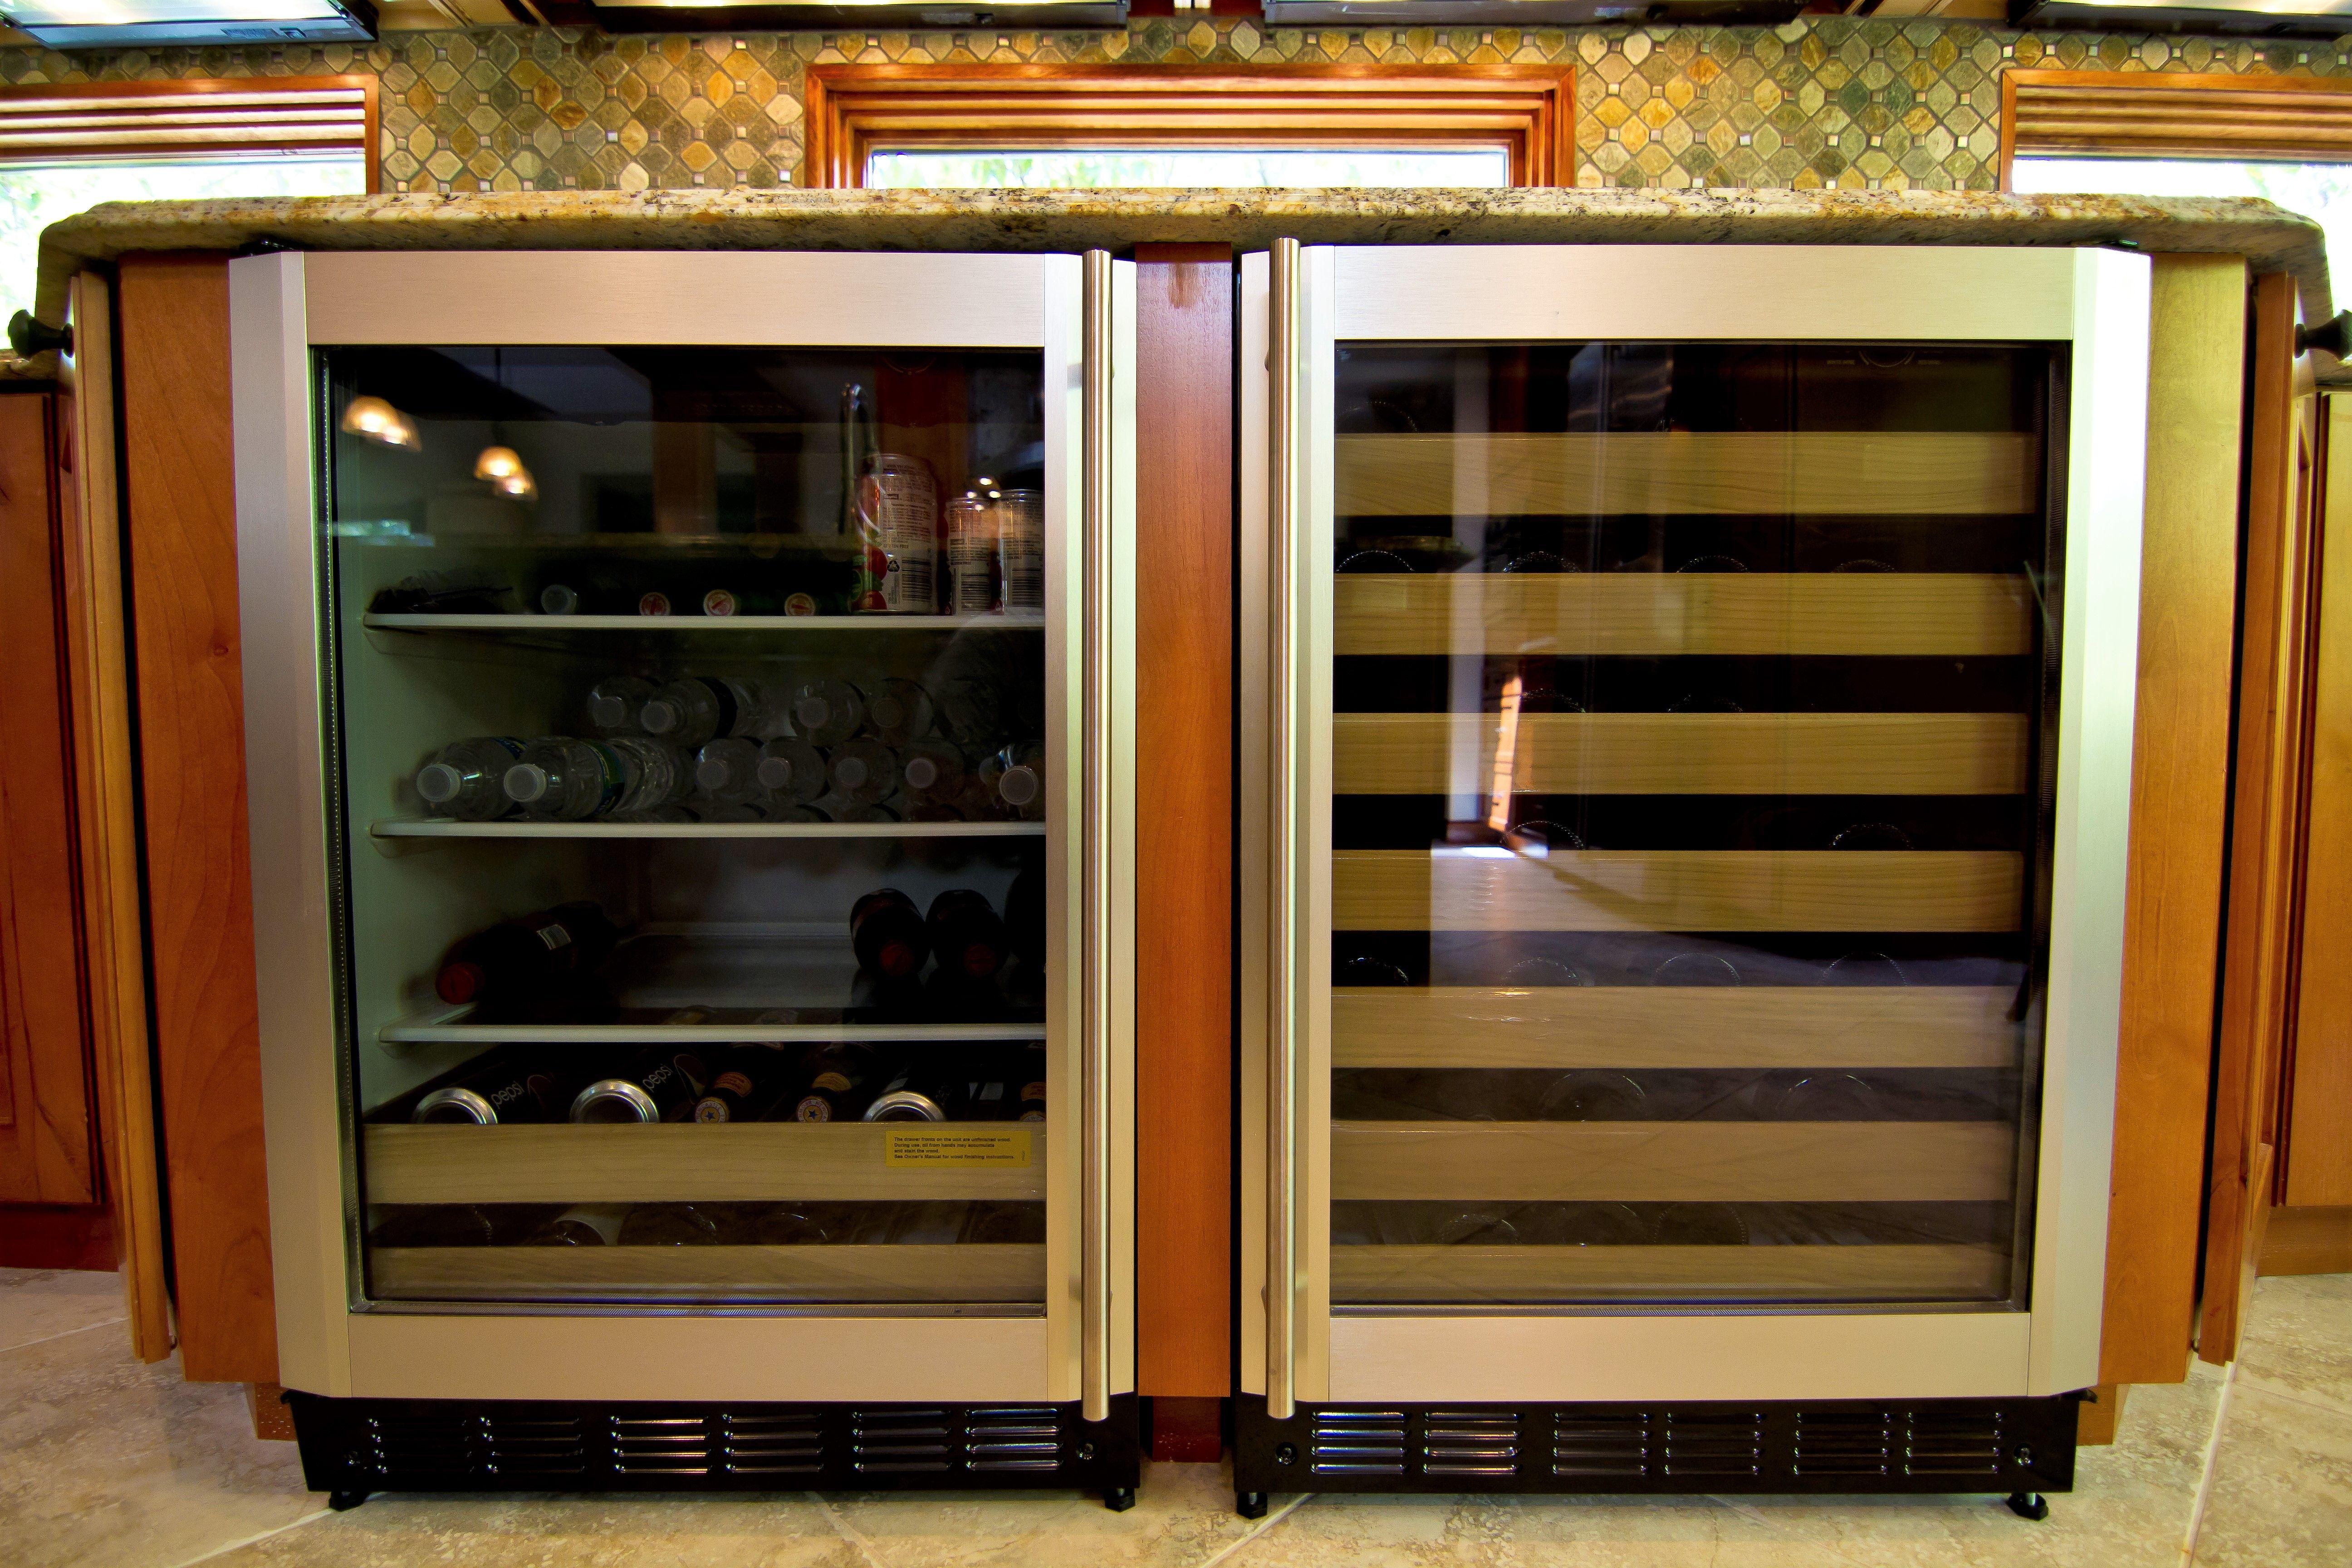 Customkitchen Monarchkitchenandbathdesign Wallovens Island Woodkitchen Wetbar Winefridge Dynamicdu Kitchen And Bath Design Bath Design Kitchen And Bath